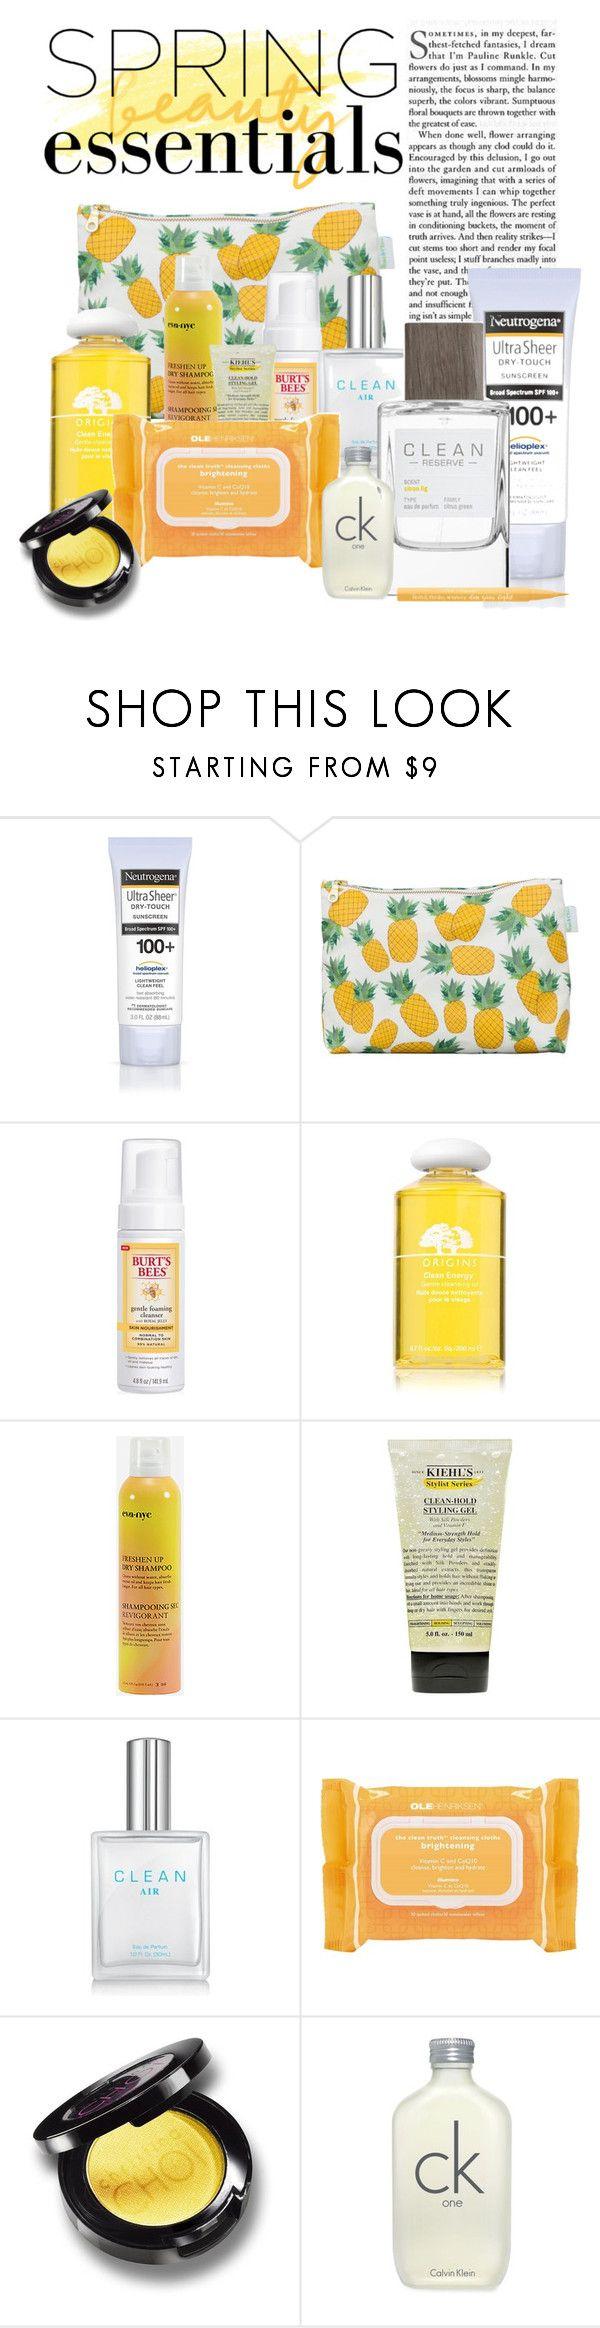 """Spring Clean"" by joyfulnoise1052 ❤ liked on Polyvore featuring beauty, Neutrogena, Rosa & Clara Designs, Burt's Bees, Origins, Eva NYC, Kiehl's, Ole Henriksen, Calvin Klein and Too Faced Cosmetics"